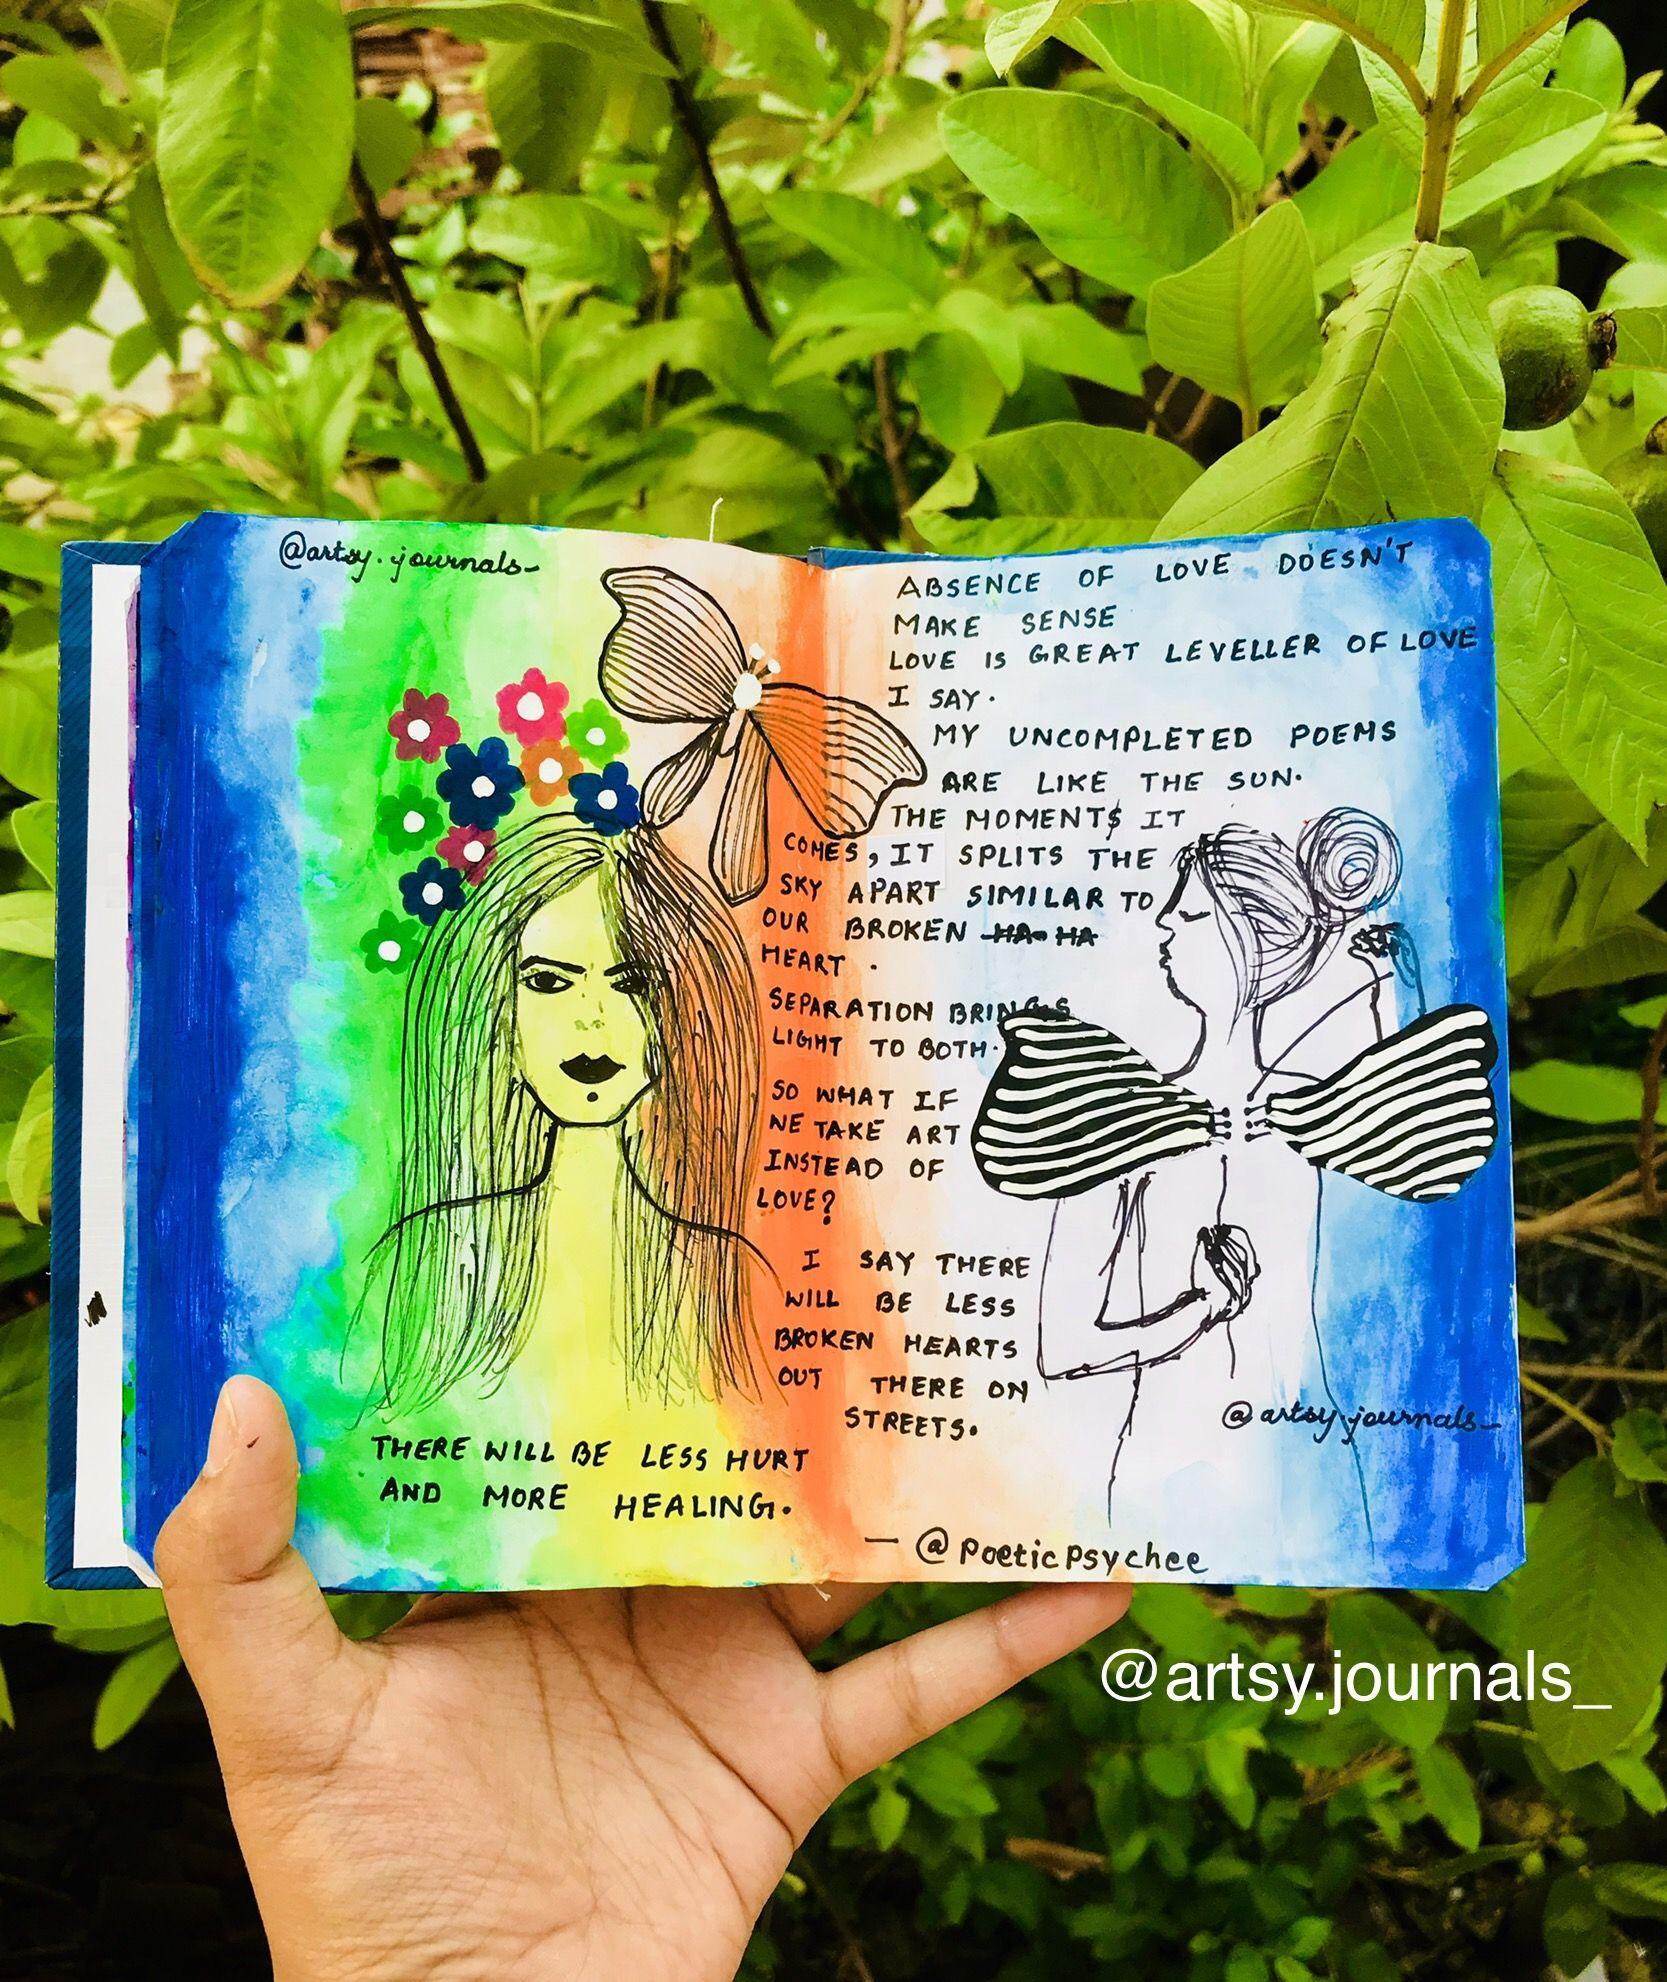 #shristiwrites #artjournal #artjournaling #artjournaleveryday  #doodler #doodles #artista #aesthetic #poetsoffig  #doodles #journal  #inspirational #writersofinstagram #illustrators  #poetsofindia #drawing #thoughts #tumblr #artsy  #persephonay #artistisofinstagram #weloveart #art_we_inspire #artsy #inspirationalwords #wordgasm #wordsofwisdom  #blogging